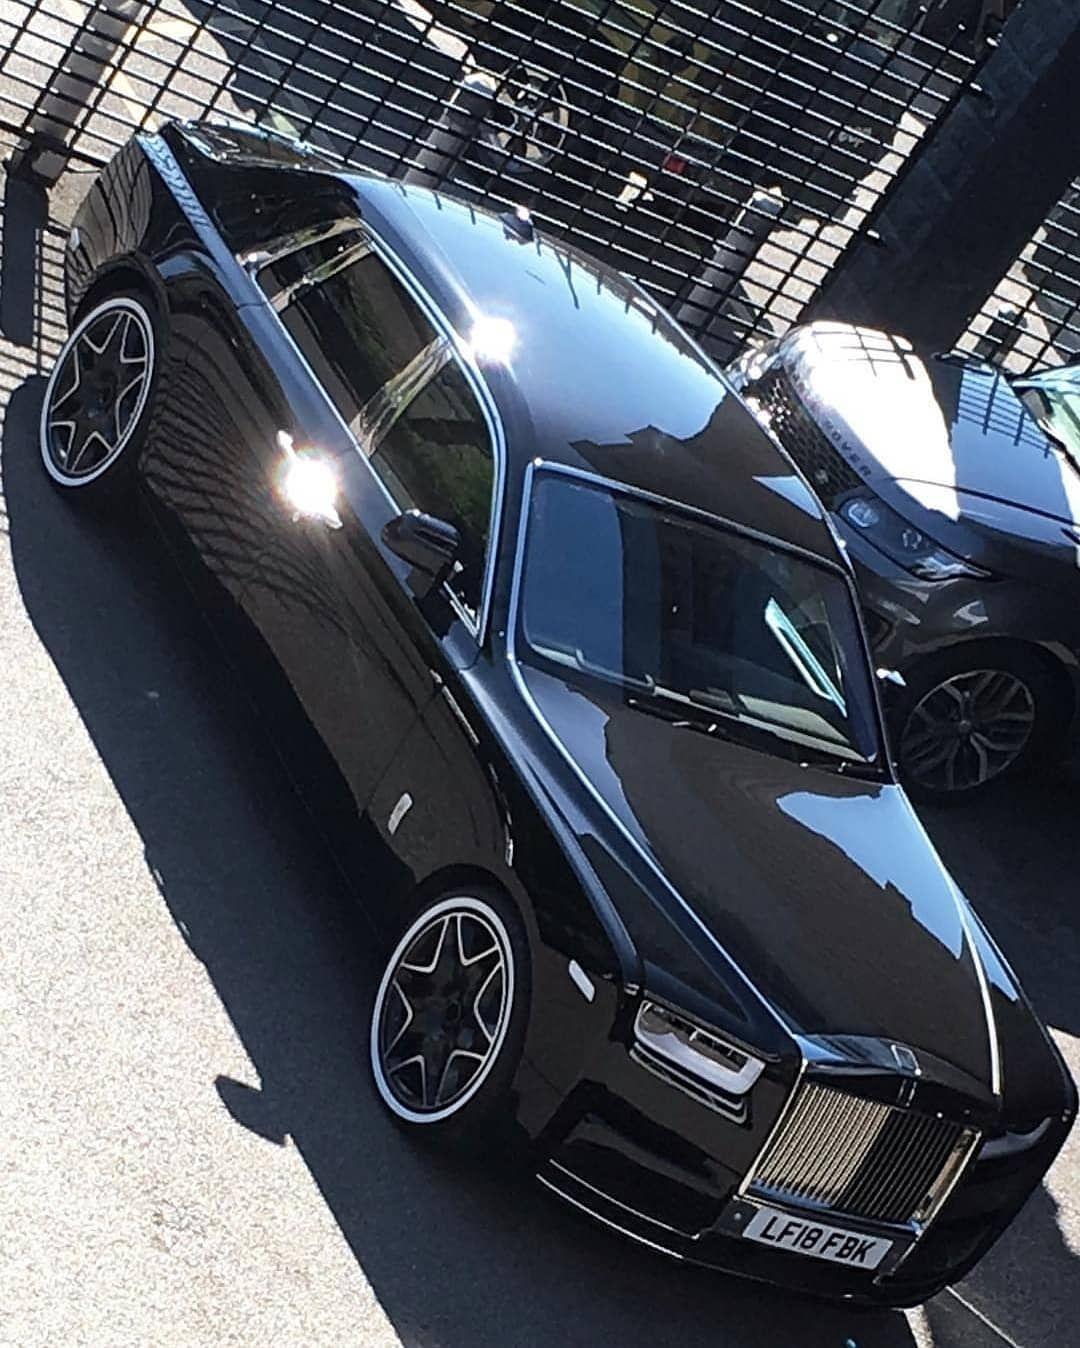 Rolls Royce Cars, Cars, Rolls